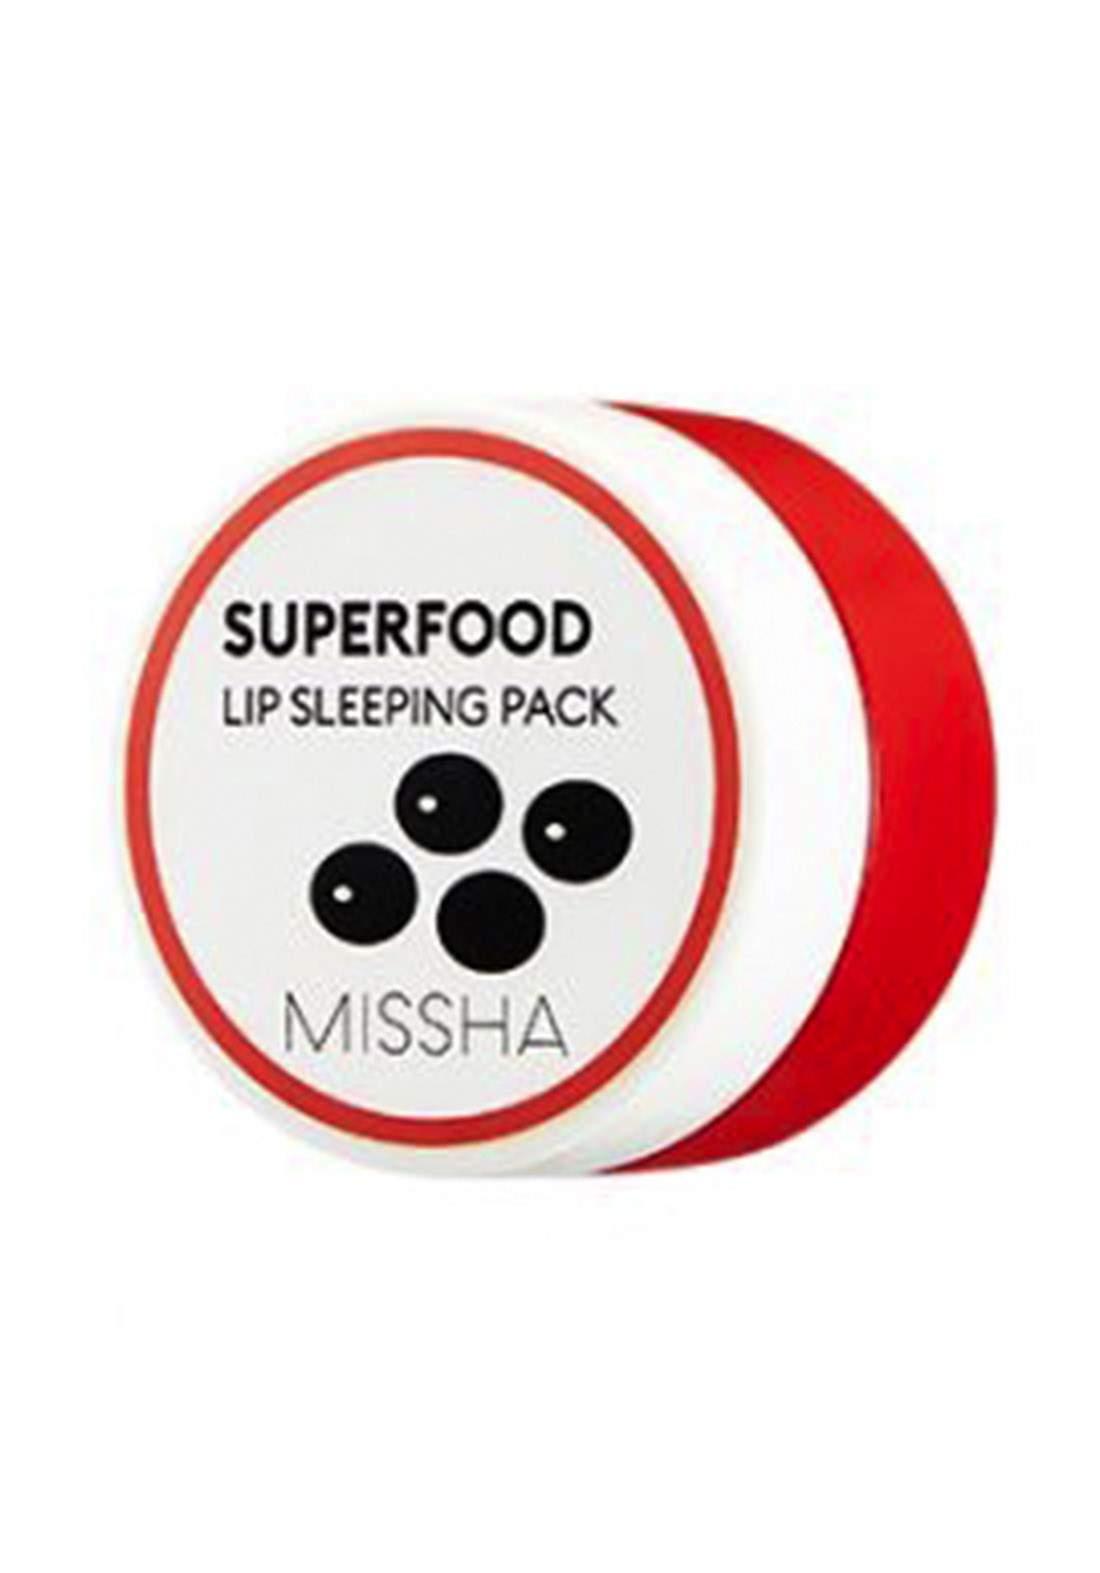 Missha Superfood Black Bean Lip Sleeping Pack 7g قناع ليلي للشفاه